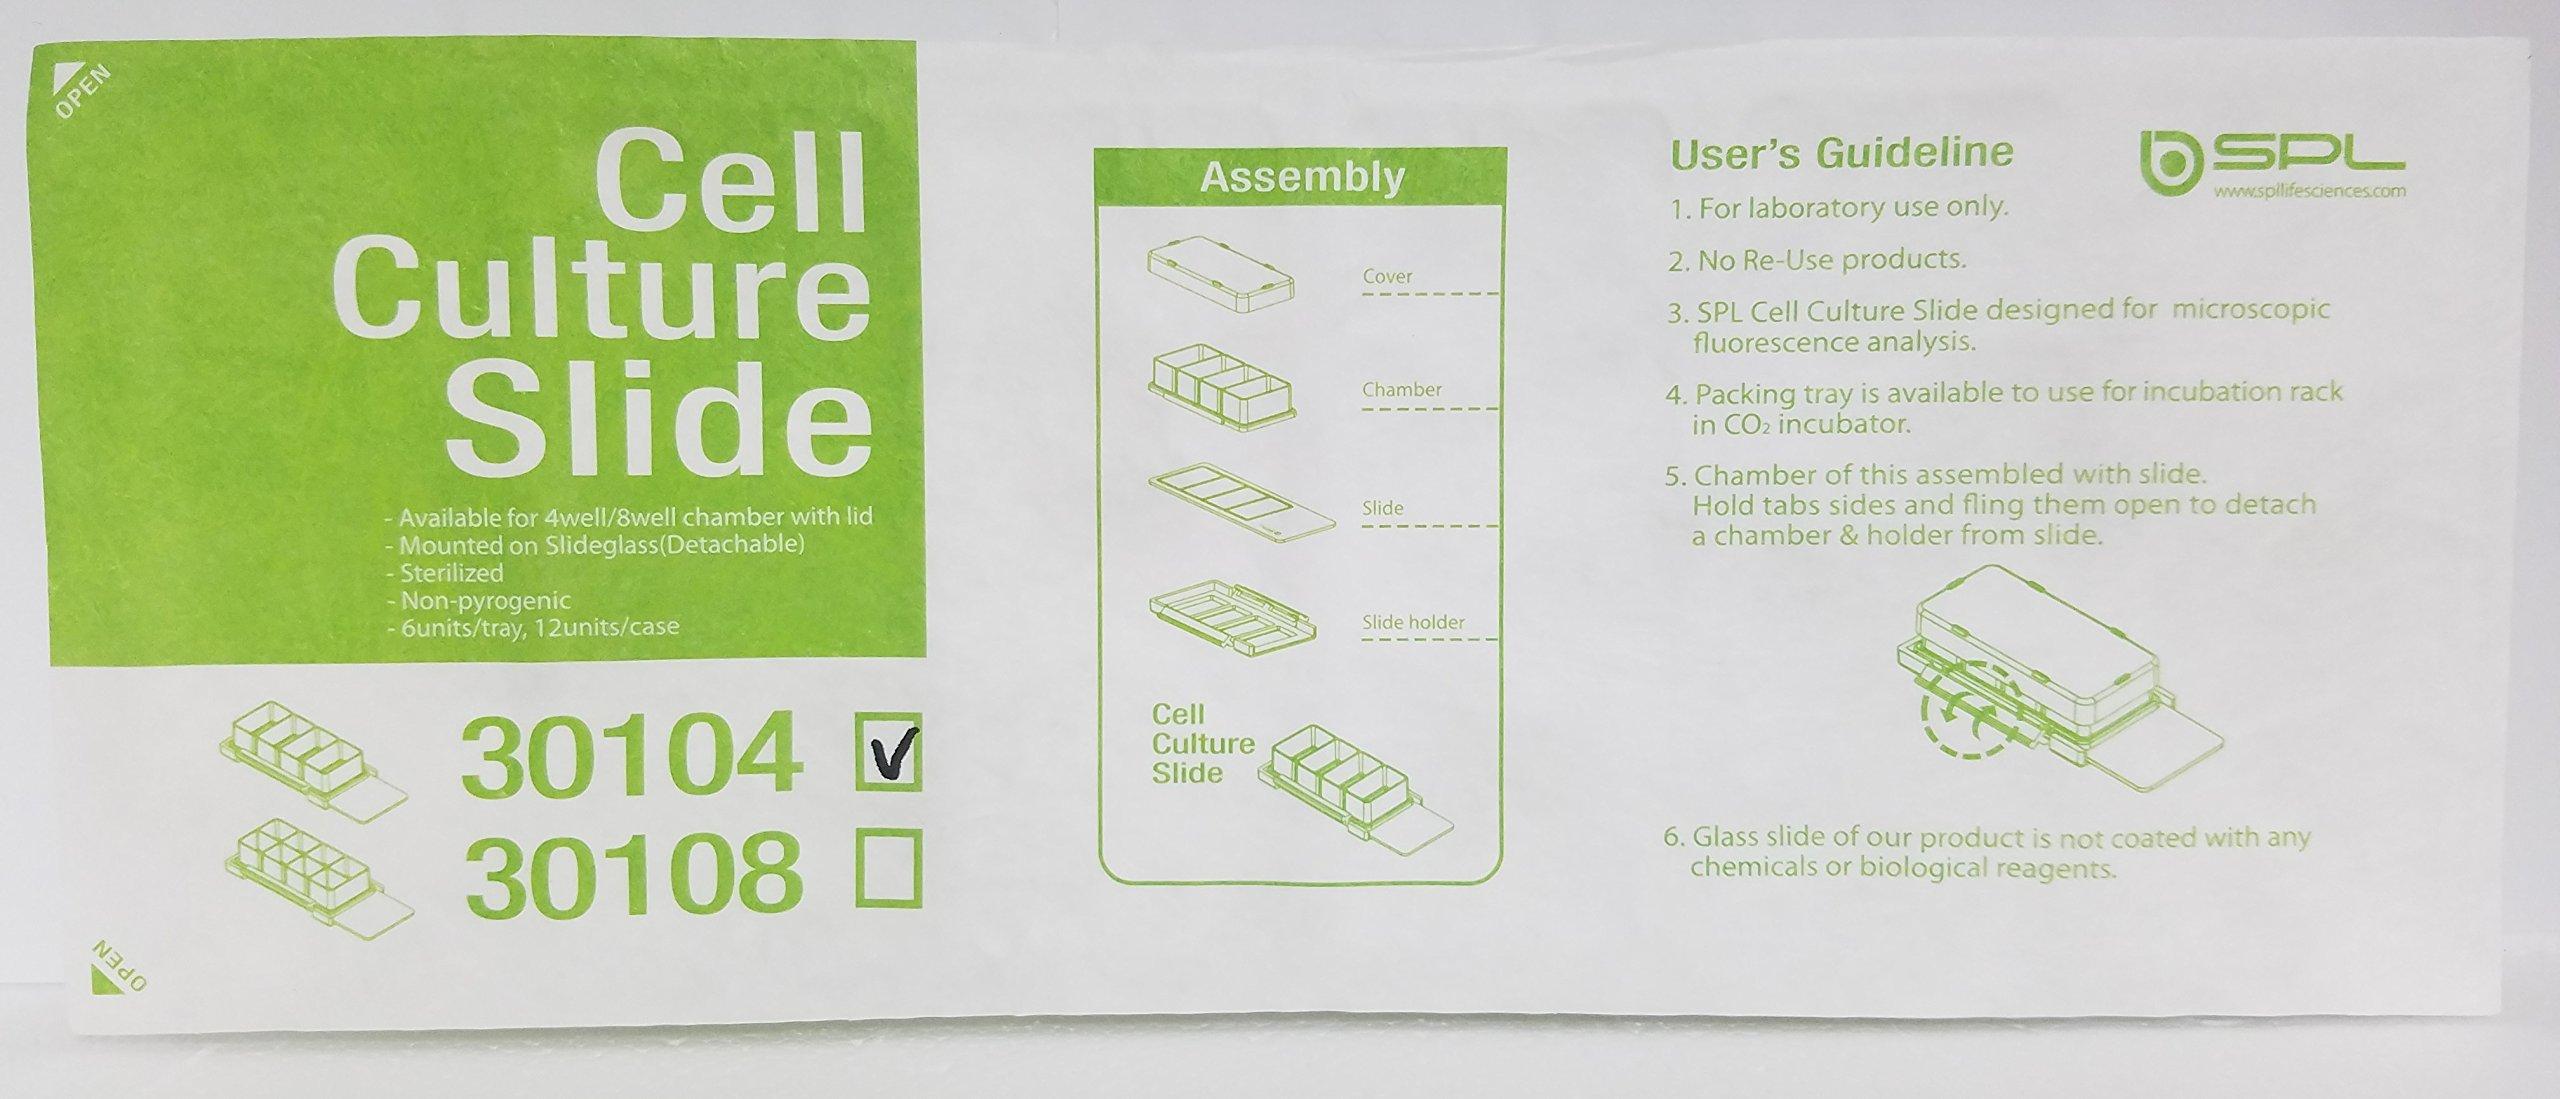 SPL Cell Culture Chamber slide, Clear, 4 wells, PS frame, glass slide, PP holder, 0.5~1.3ml, Sterile, Case of 12 // 2 pack of 6